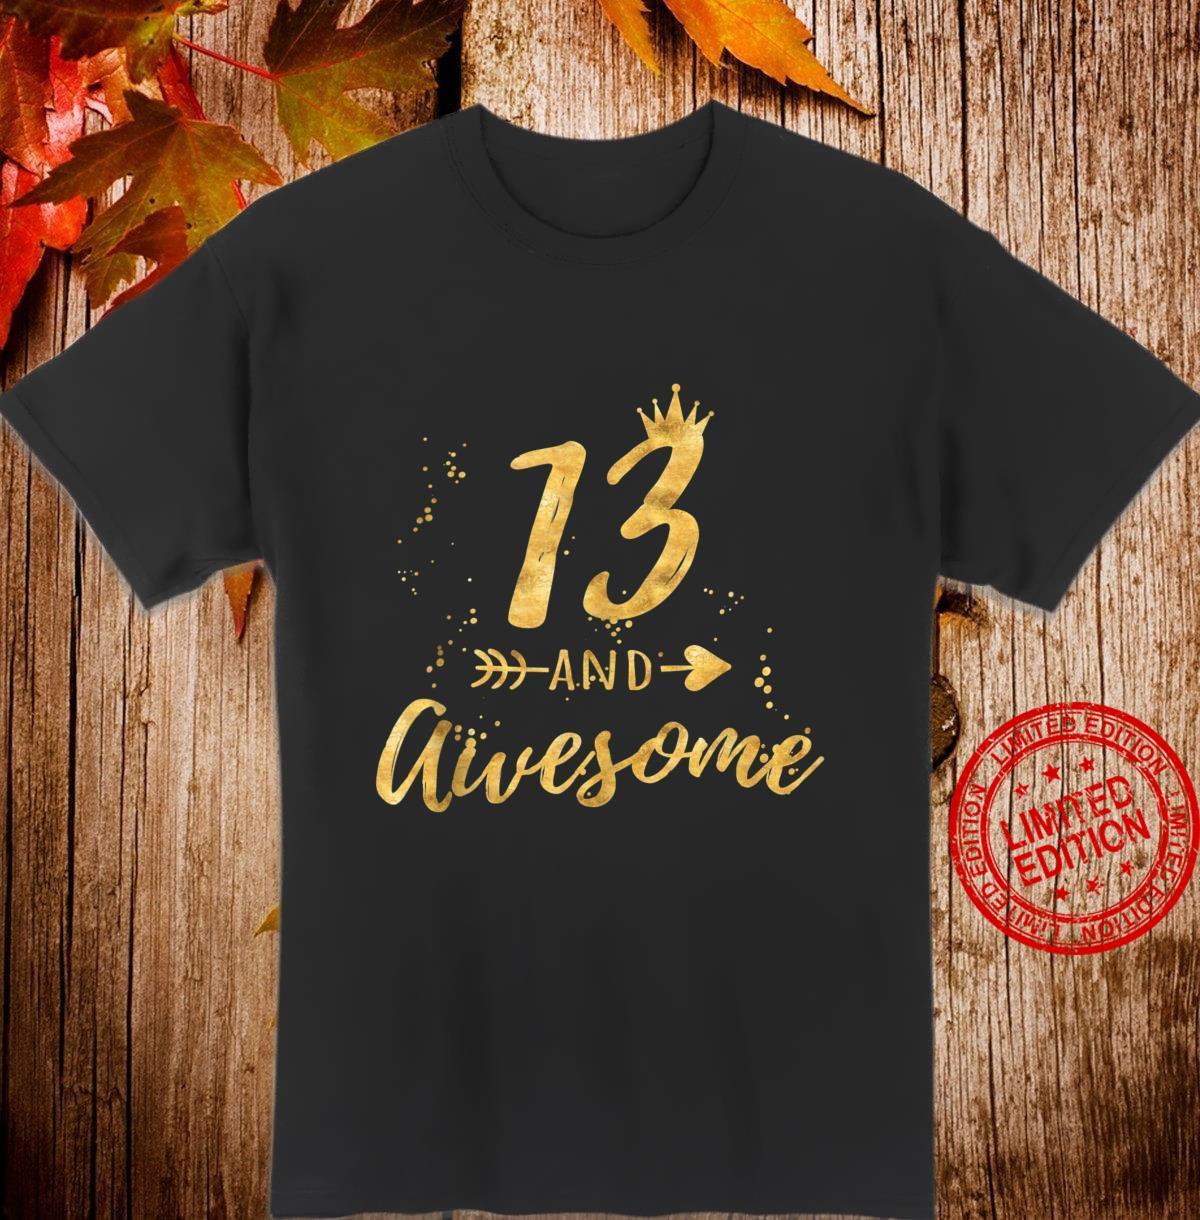 13th Birthday Shirt for Teen Girl, 13 and Awesome Shirt